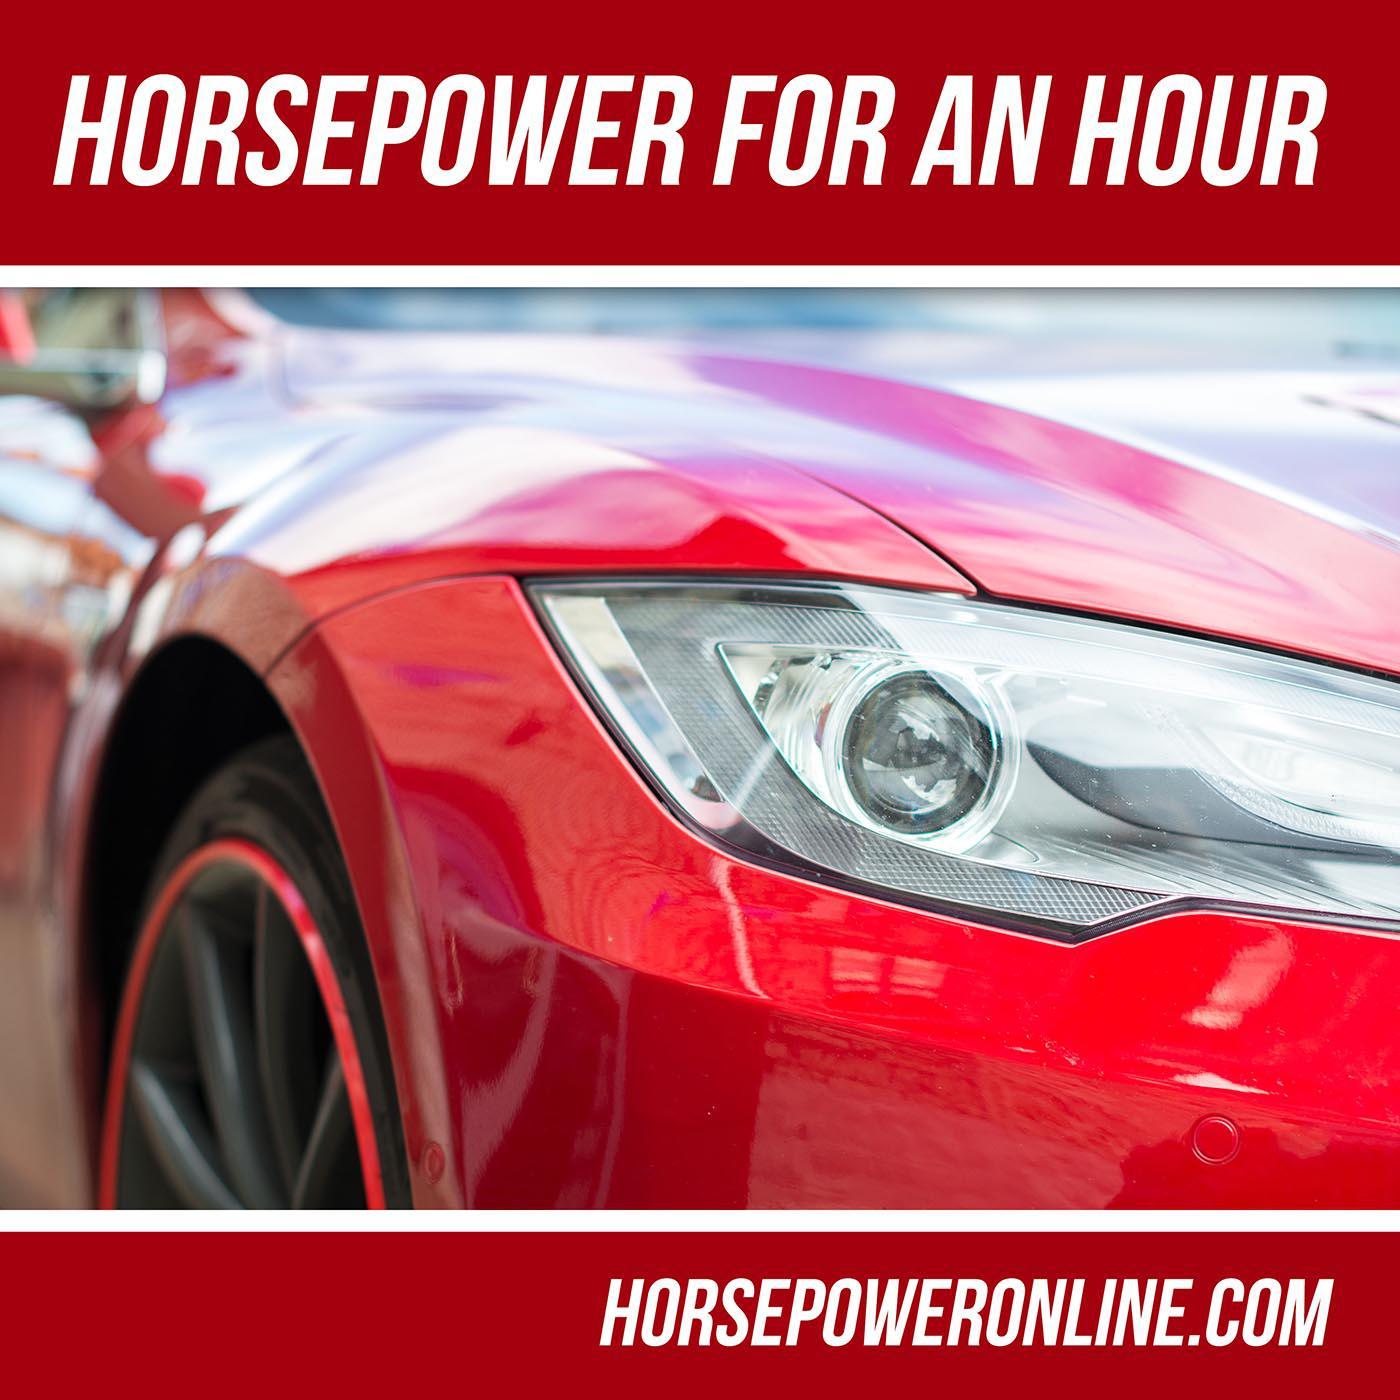 Horsepower for an Hour (podcast) - Horsepower for an Hour